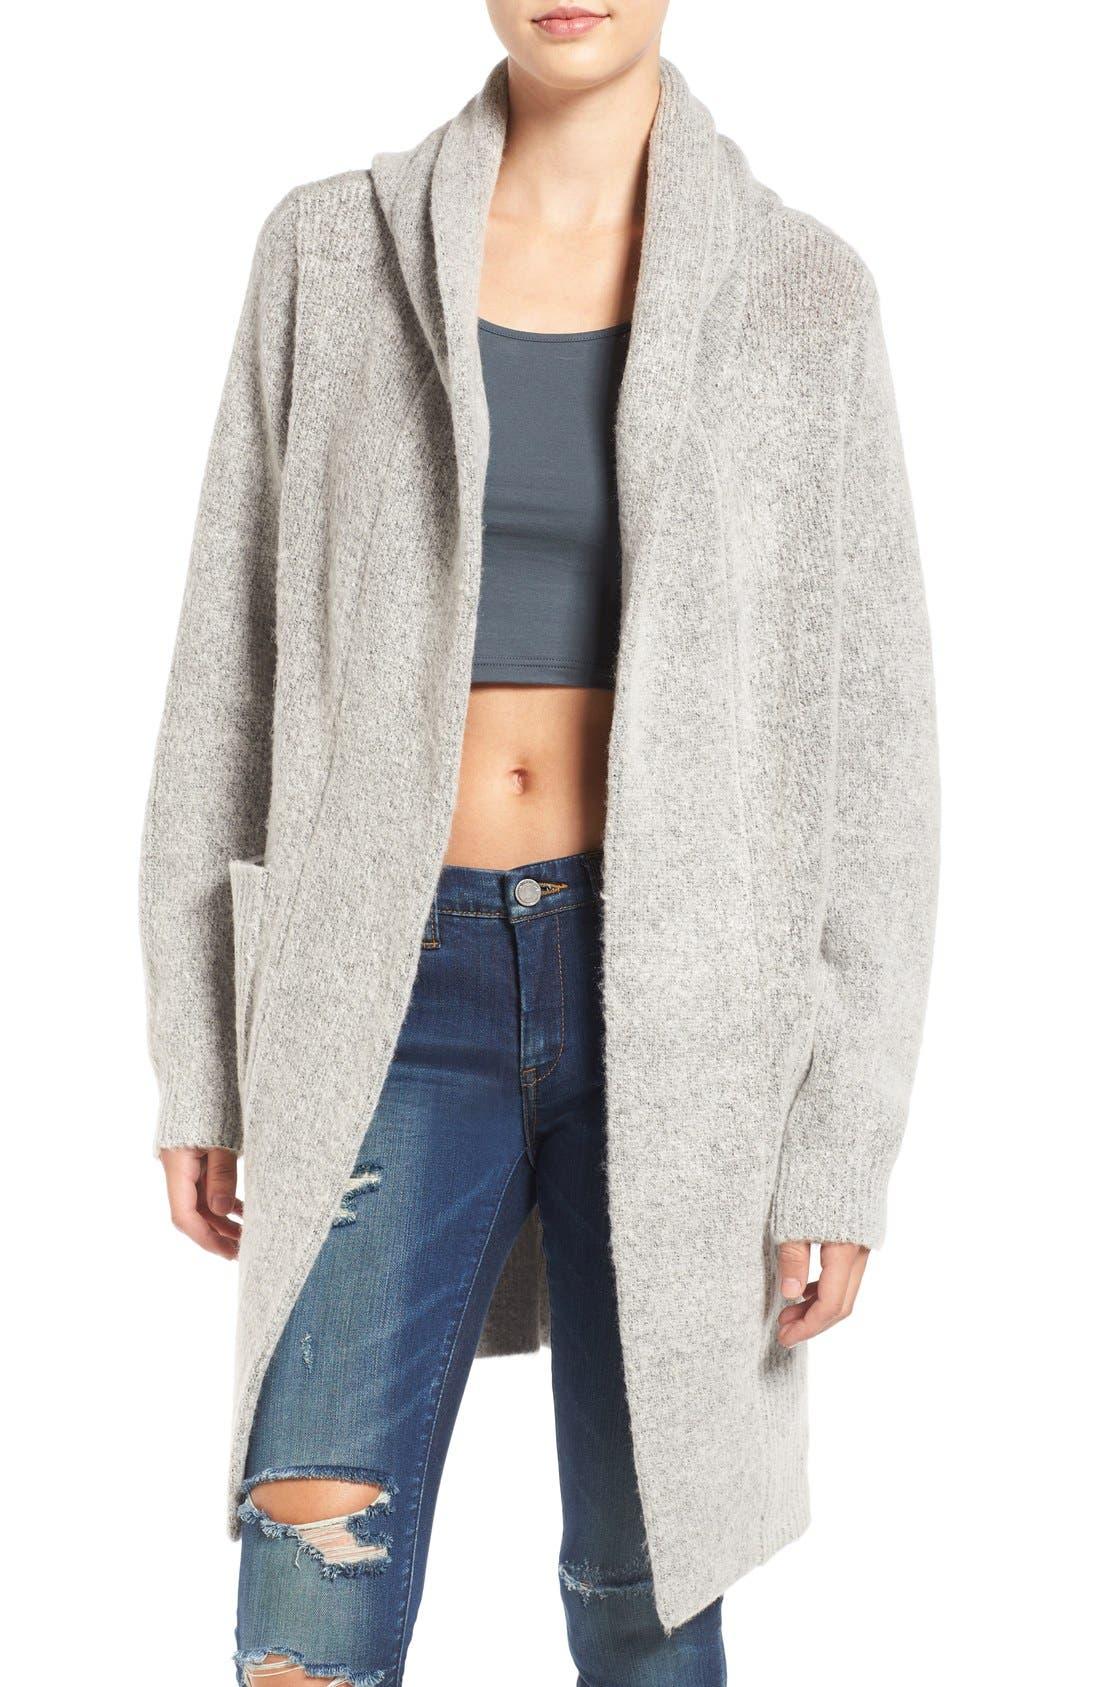 Main Image - BLANKNYC 'Textationship' Knit Hooded Cardigan